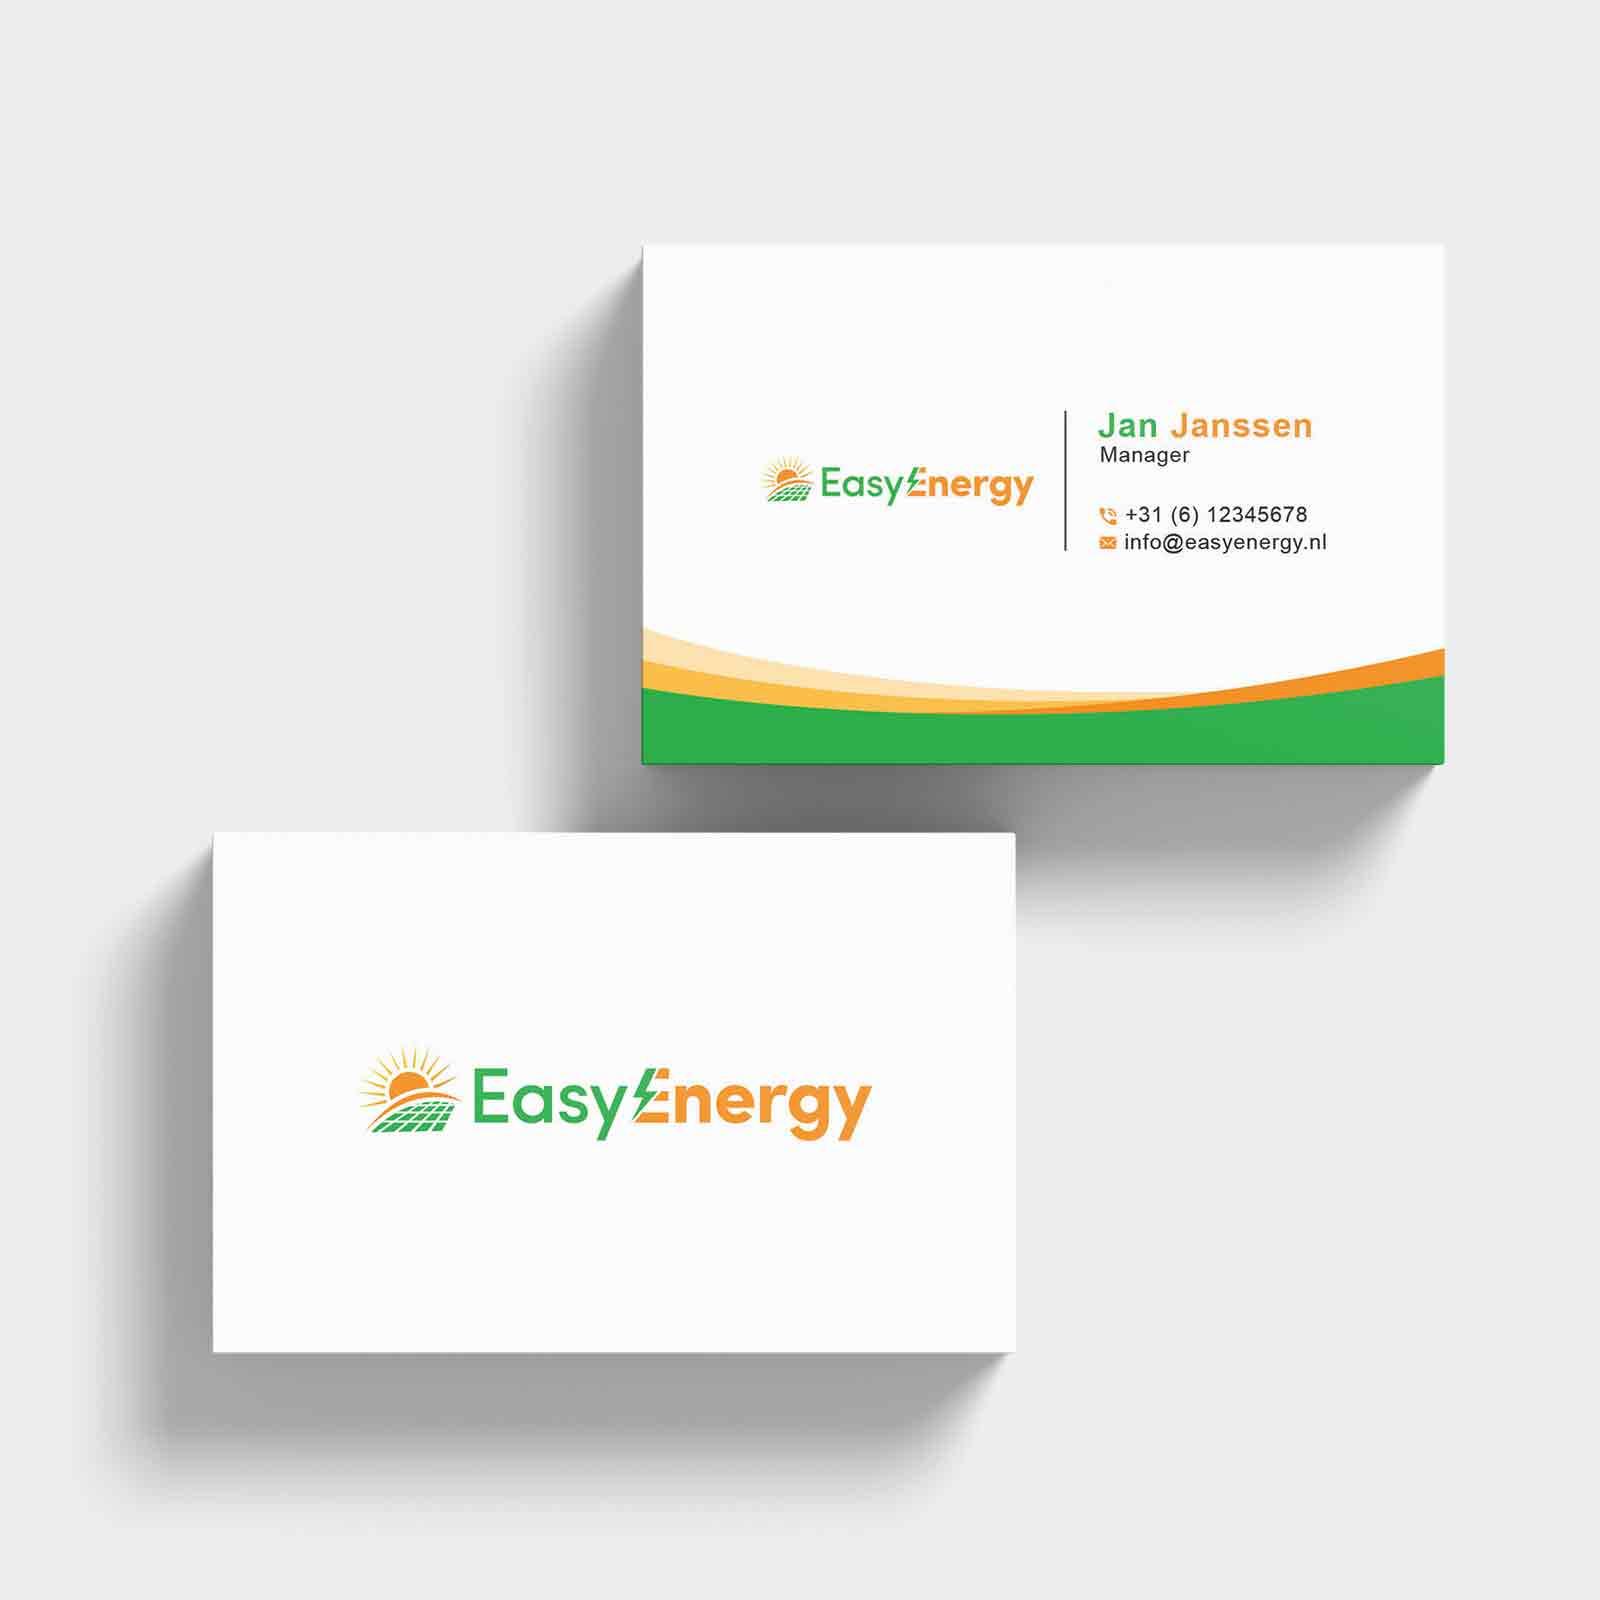 EasyEnergy Roermond | DesignMyLogo